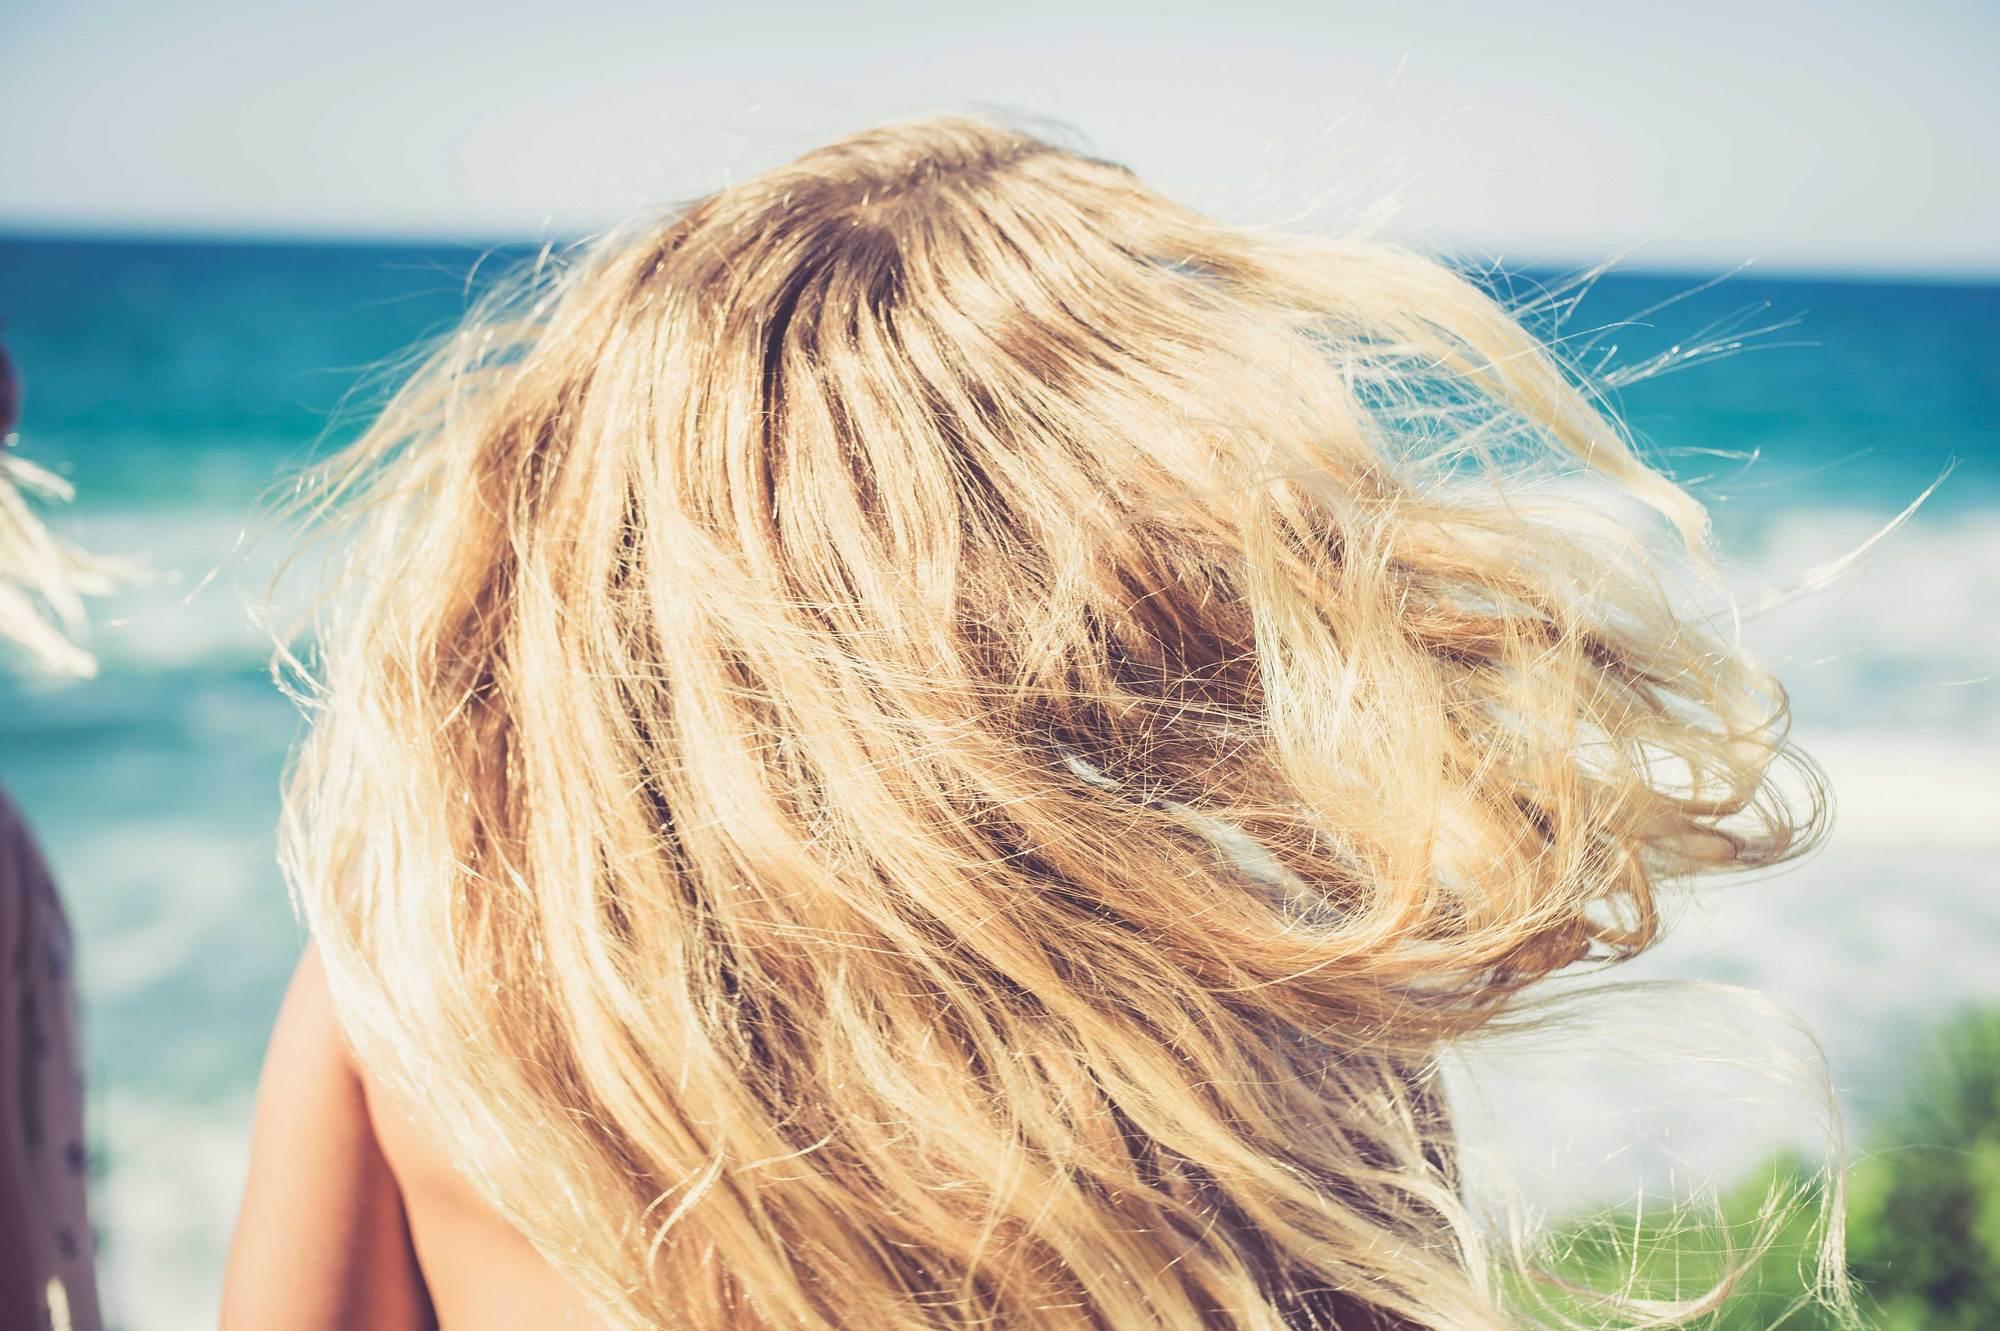 Картинки блондинок со спины со средними волосами на море